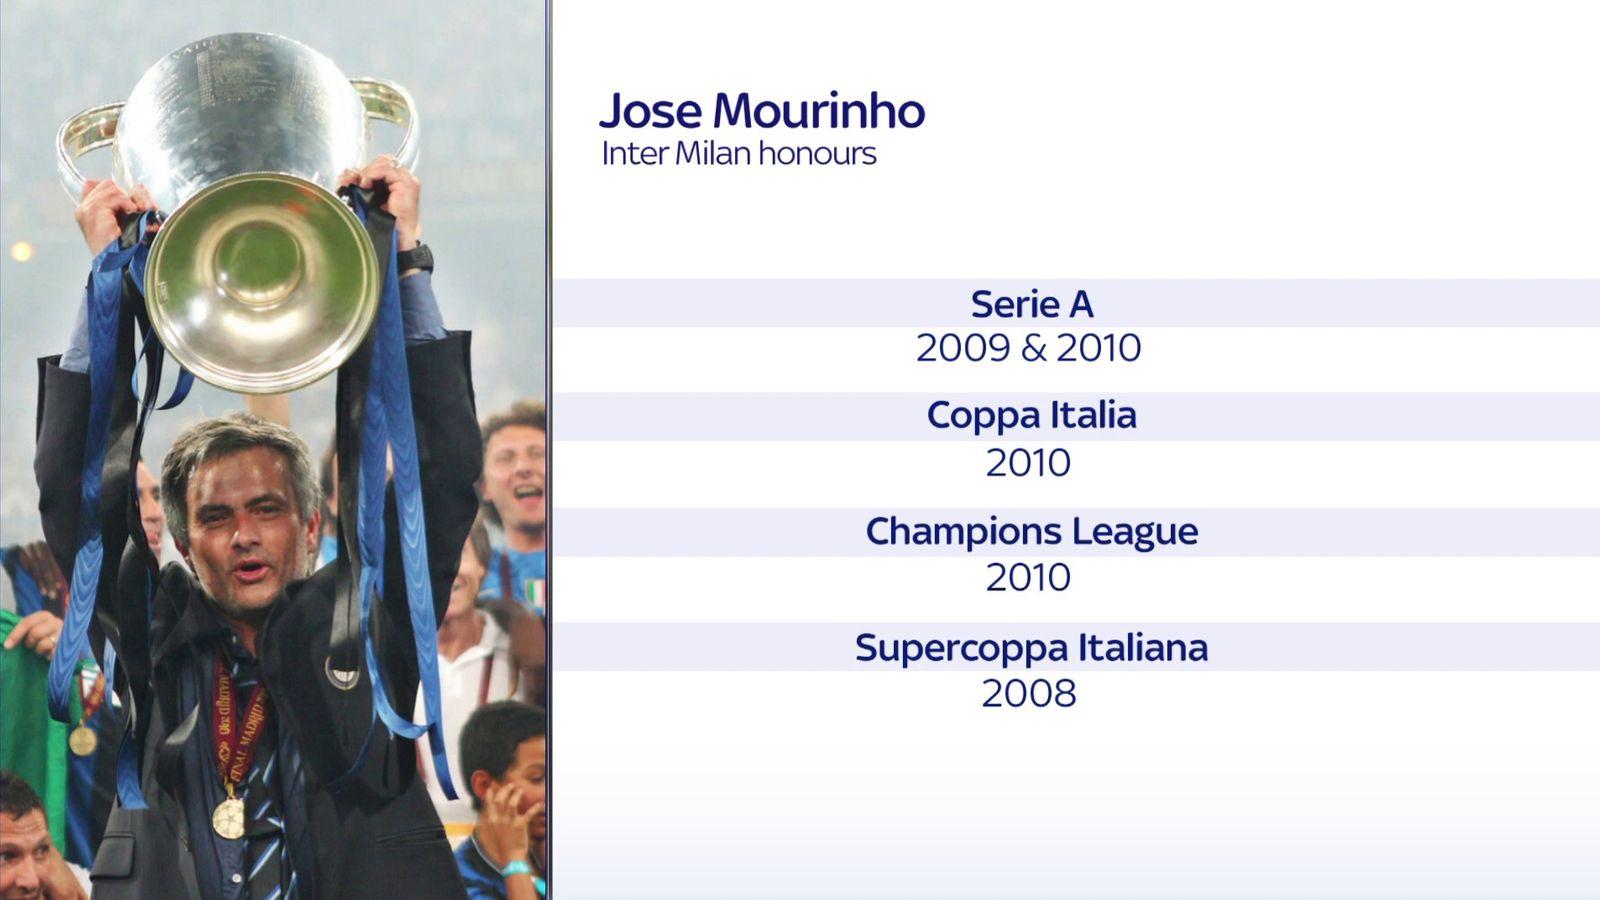 Prestasi Jose Mourinho bersama Inter Milan di Serie A Italia. (Sumber: Sky Sports)